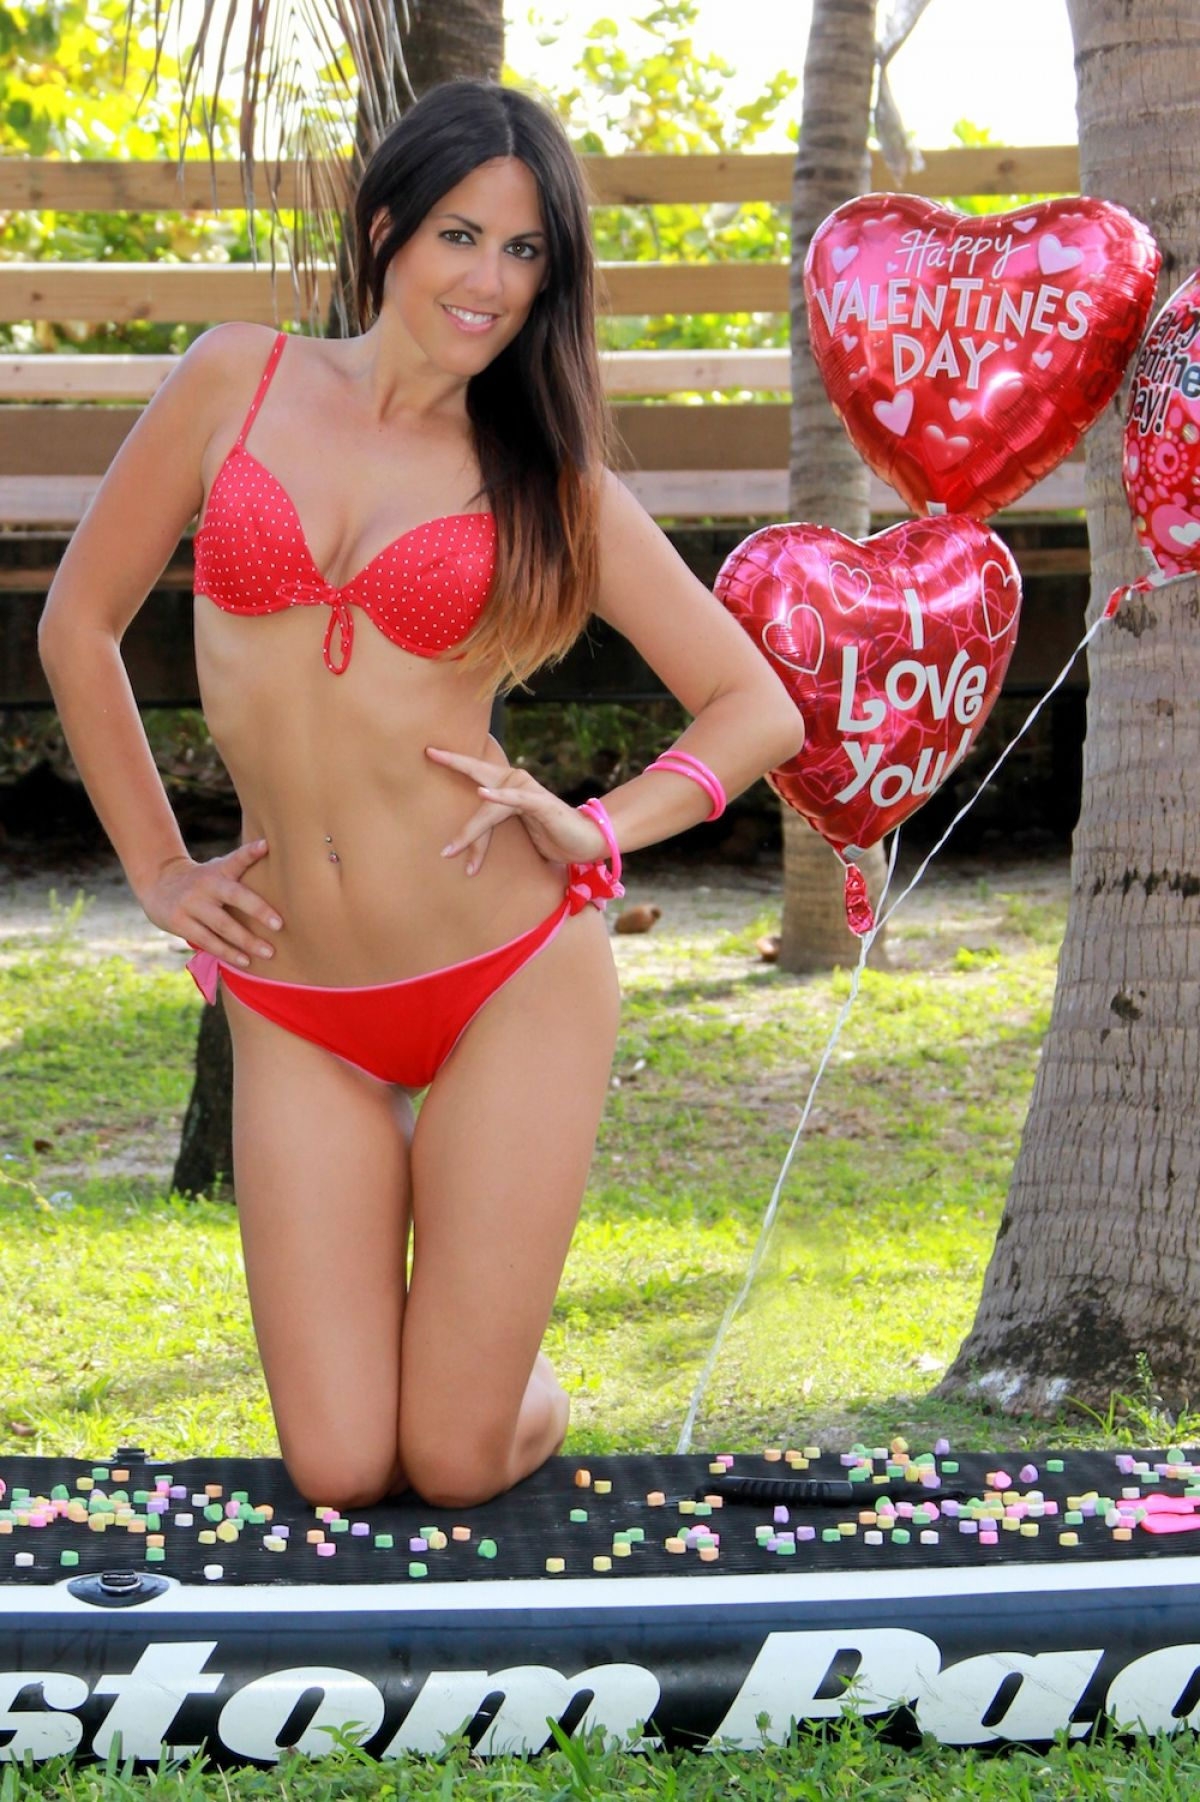 ��� ������ ������ �� ���� ����� Valentine�s Paddleboard �� ��� ������ ������ 2015 Claudia Romani